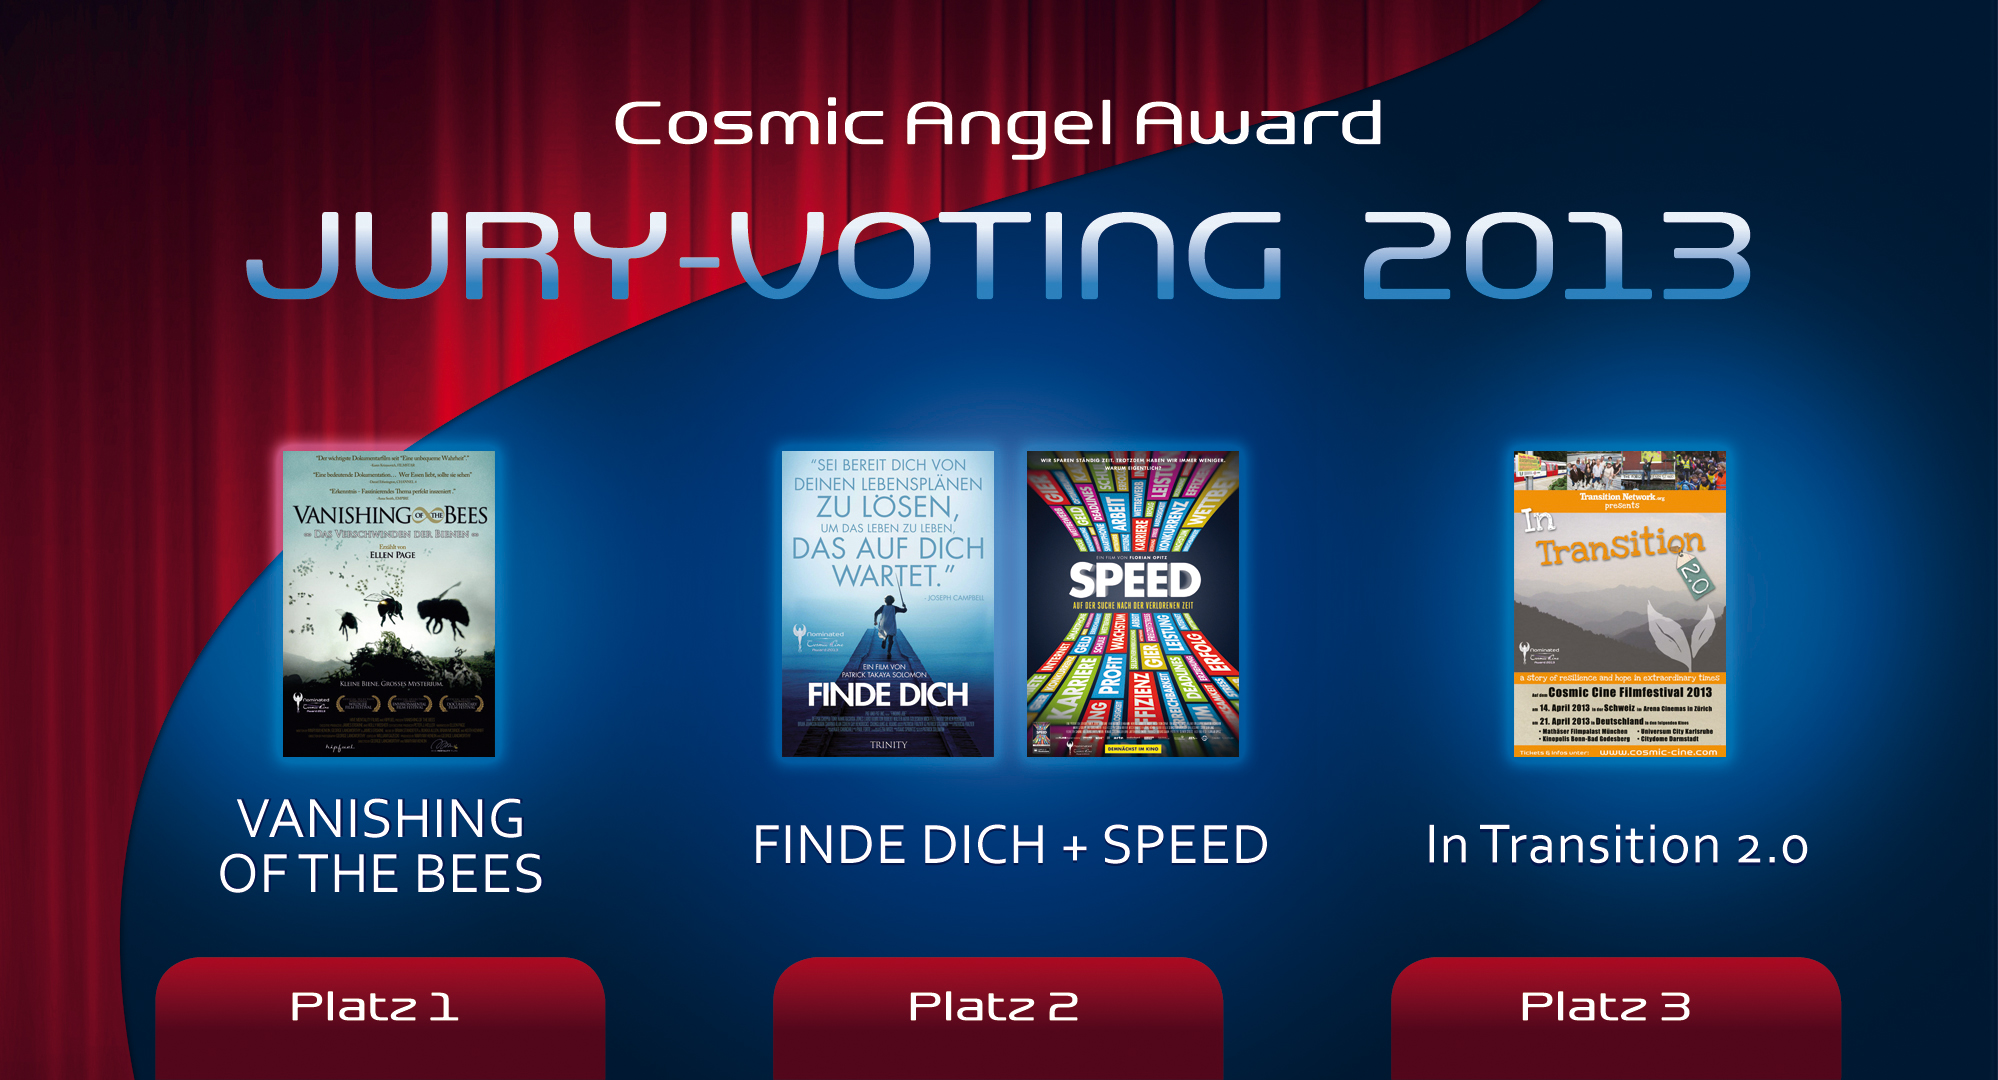 01 Cosmic Cine Filmfestival 2013 - Cosmic Angel Award 2013 JURY